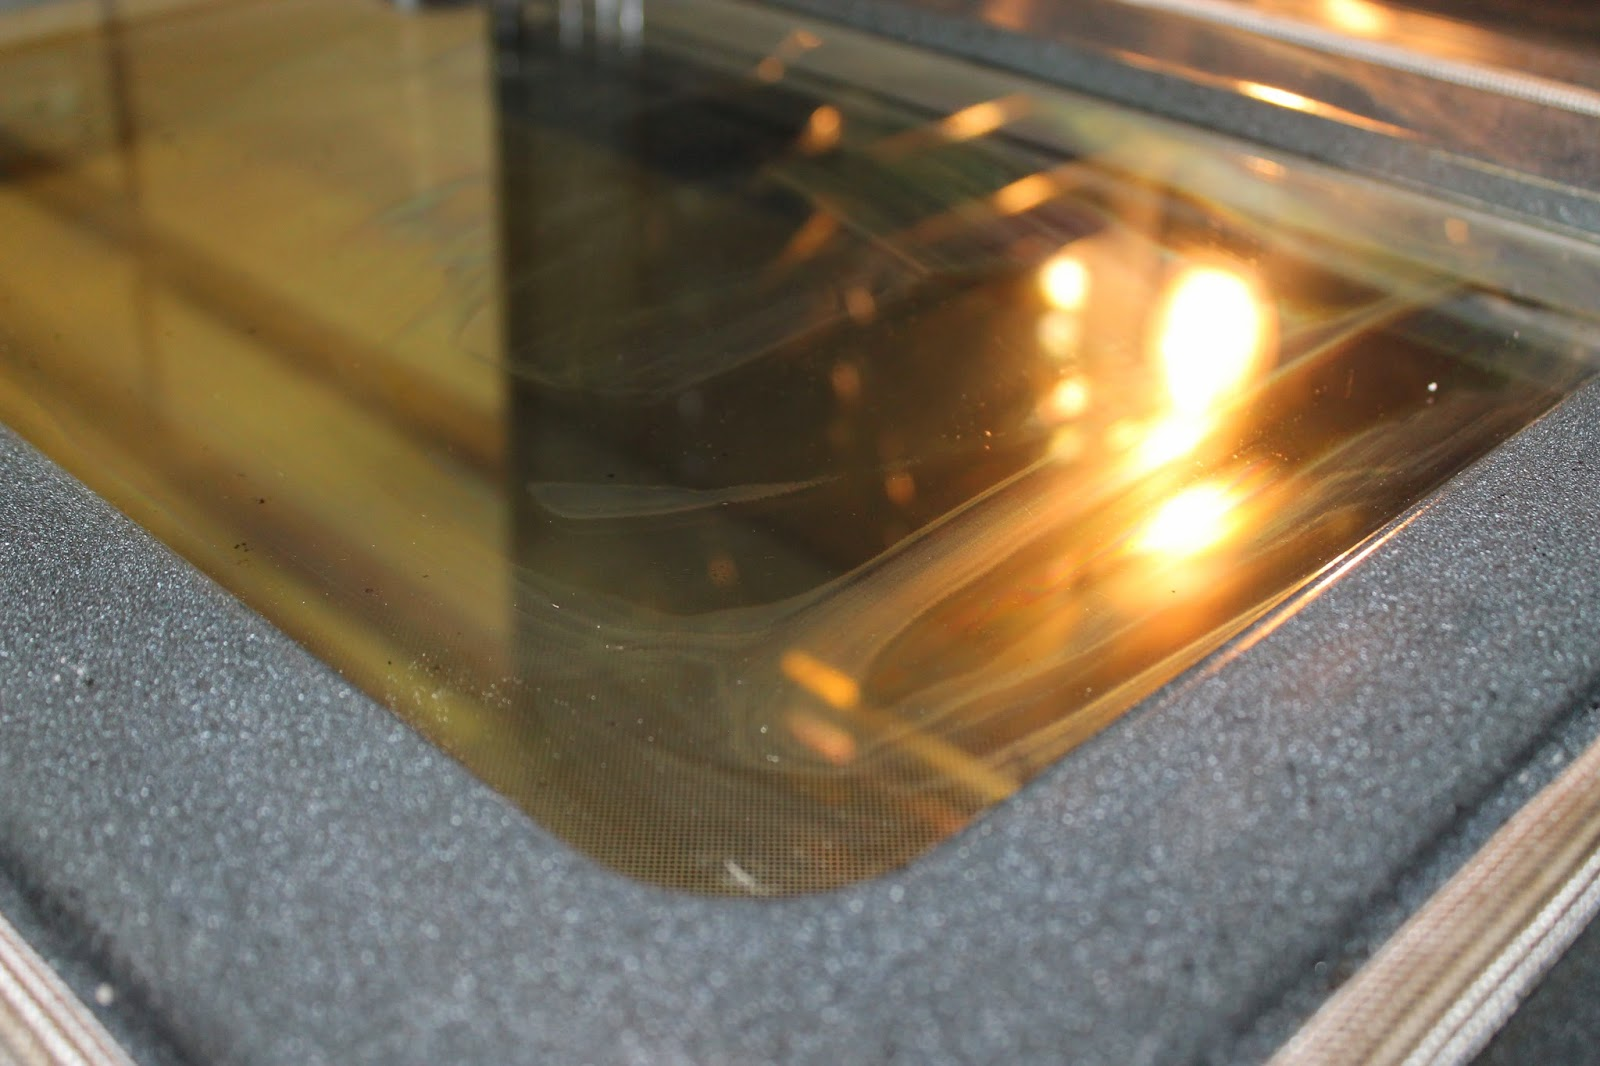 how to clean oven glass door with baking soda